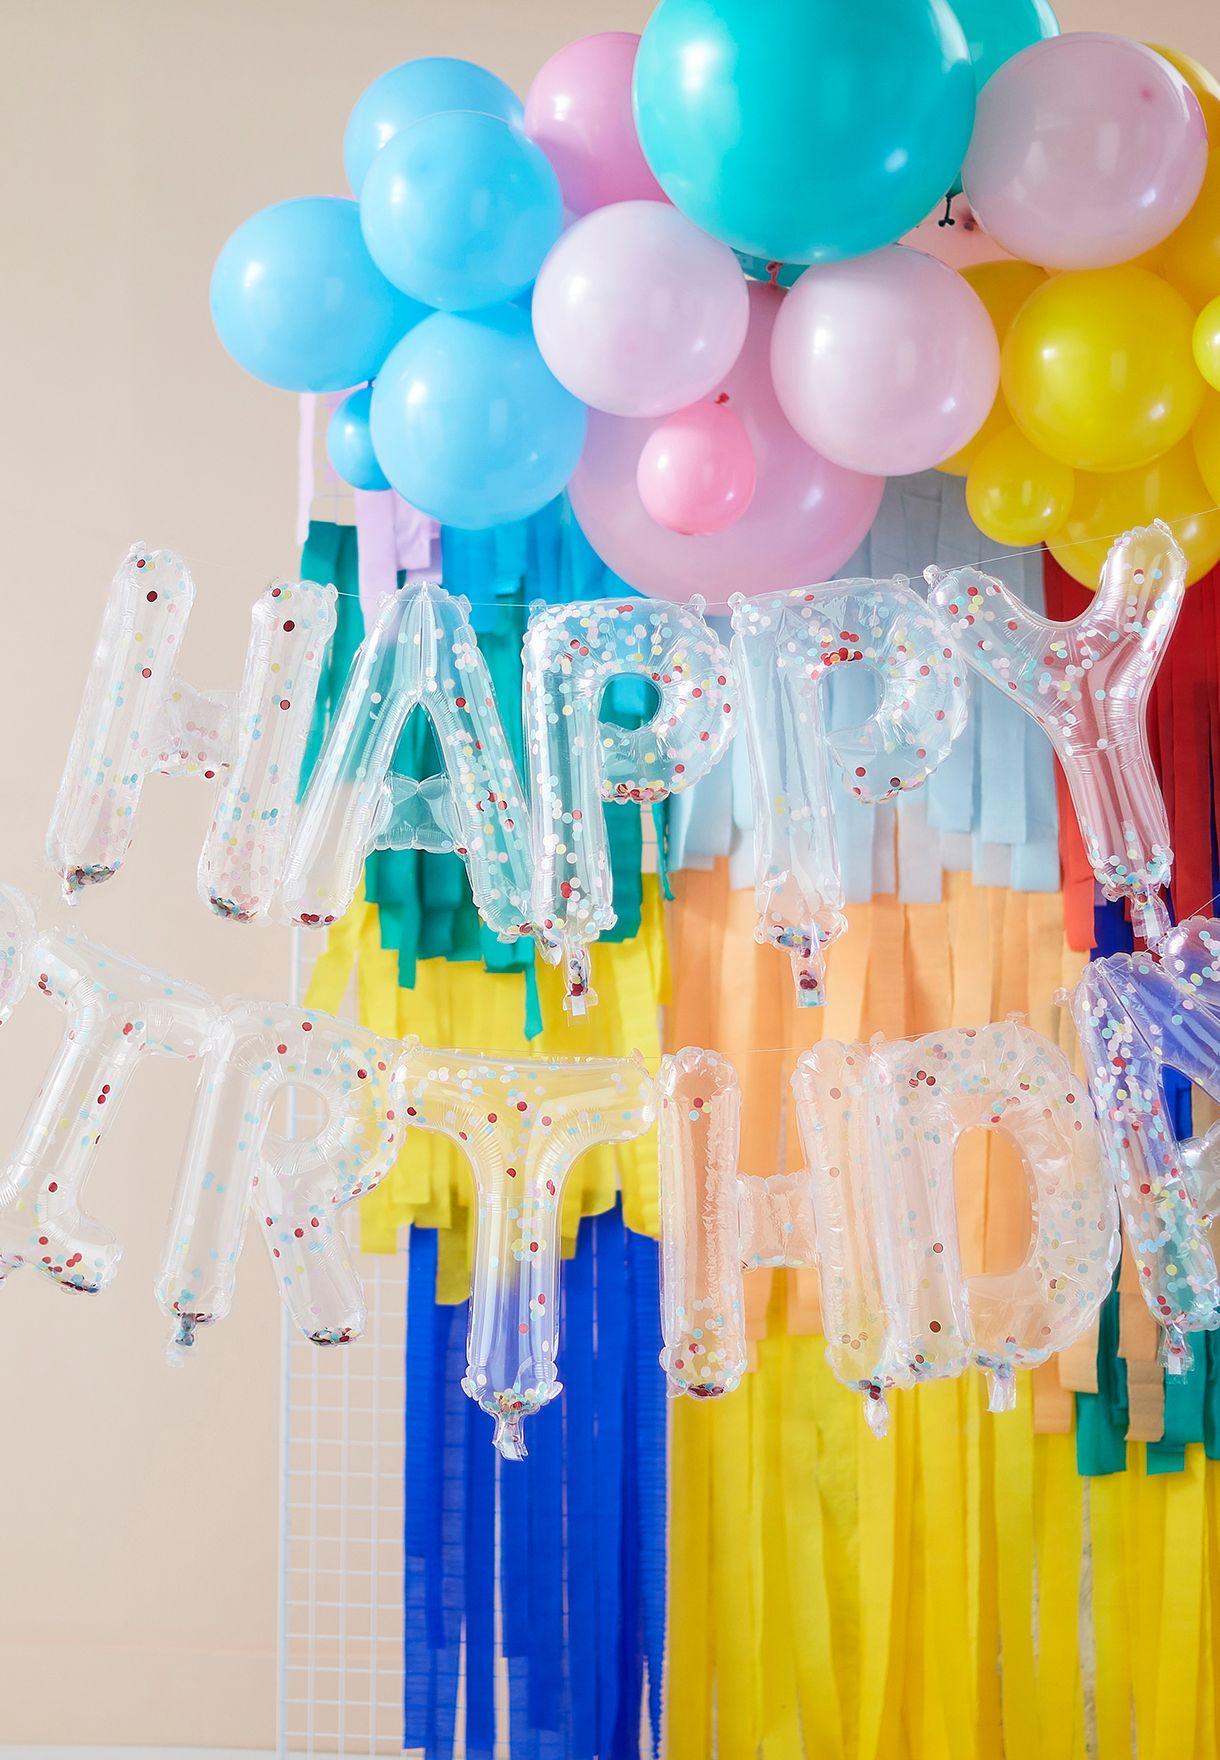 Happy Birthday Confetti Balloon